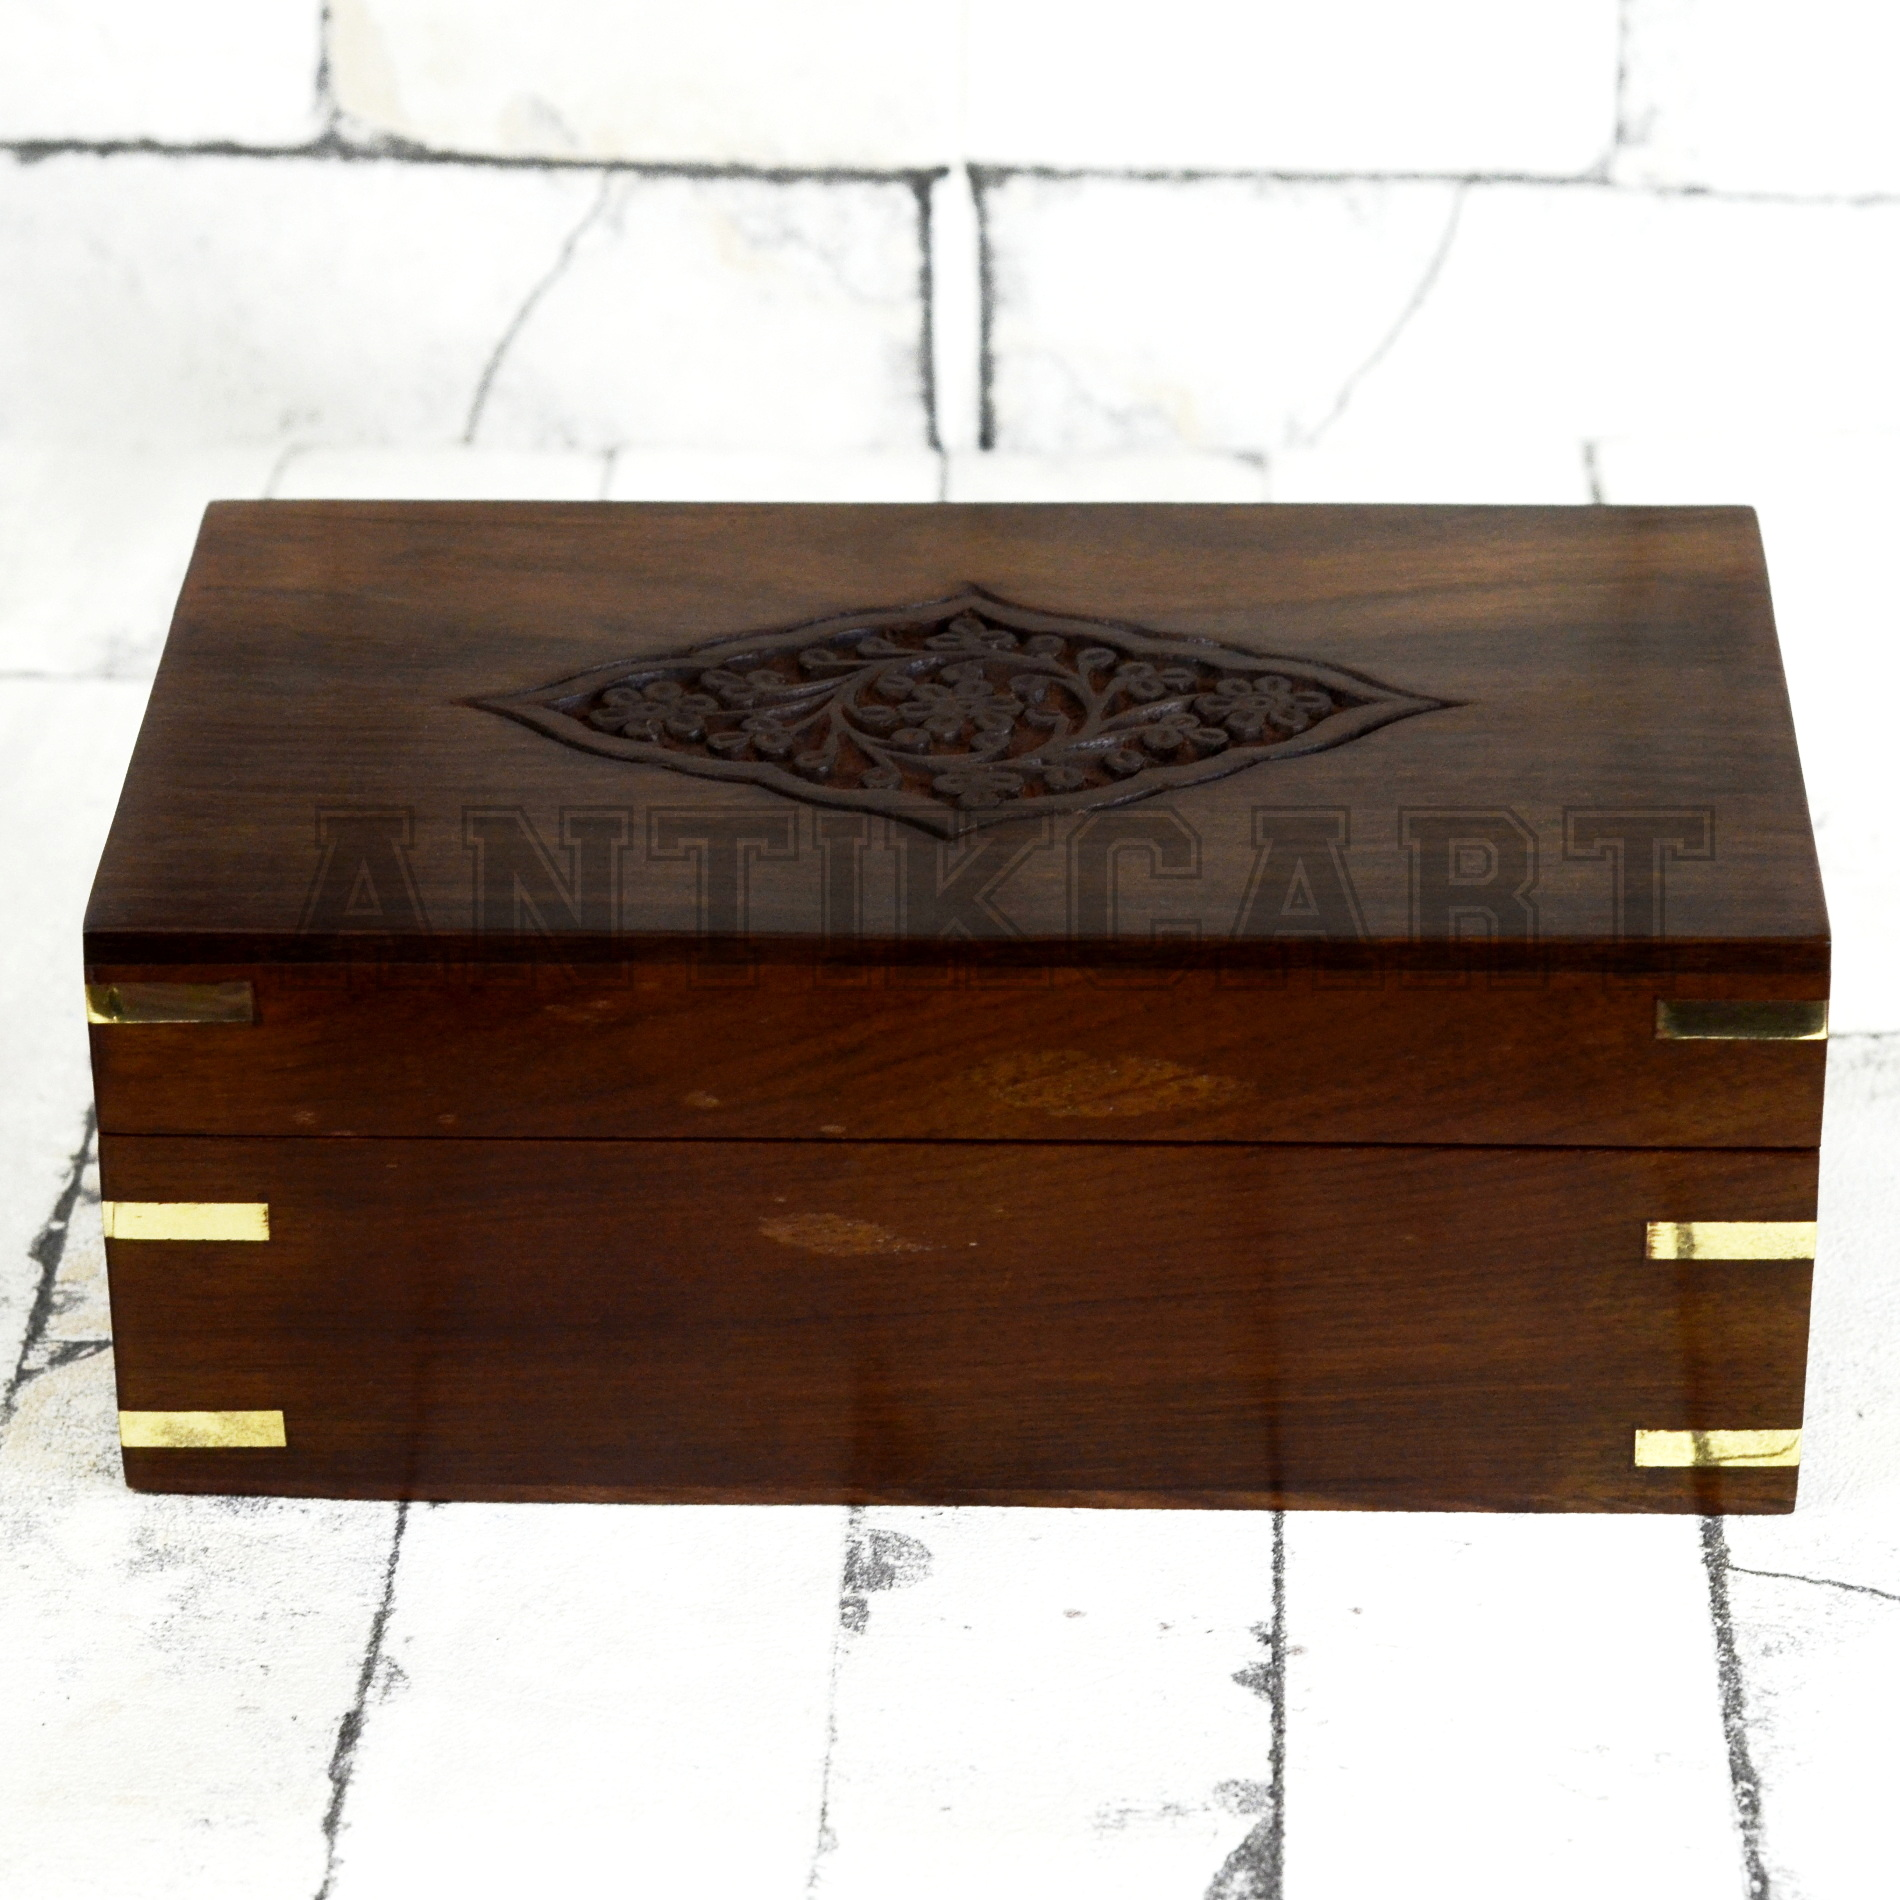 Handcarved Wooden Spice Storage Box Antikcart